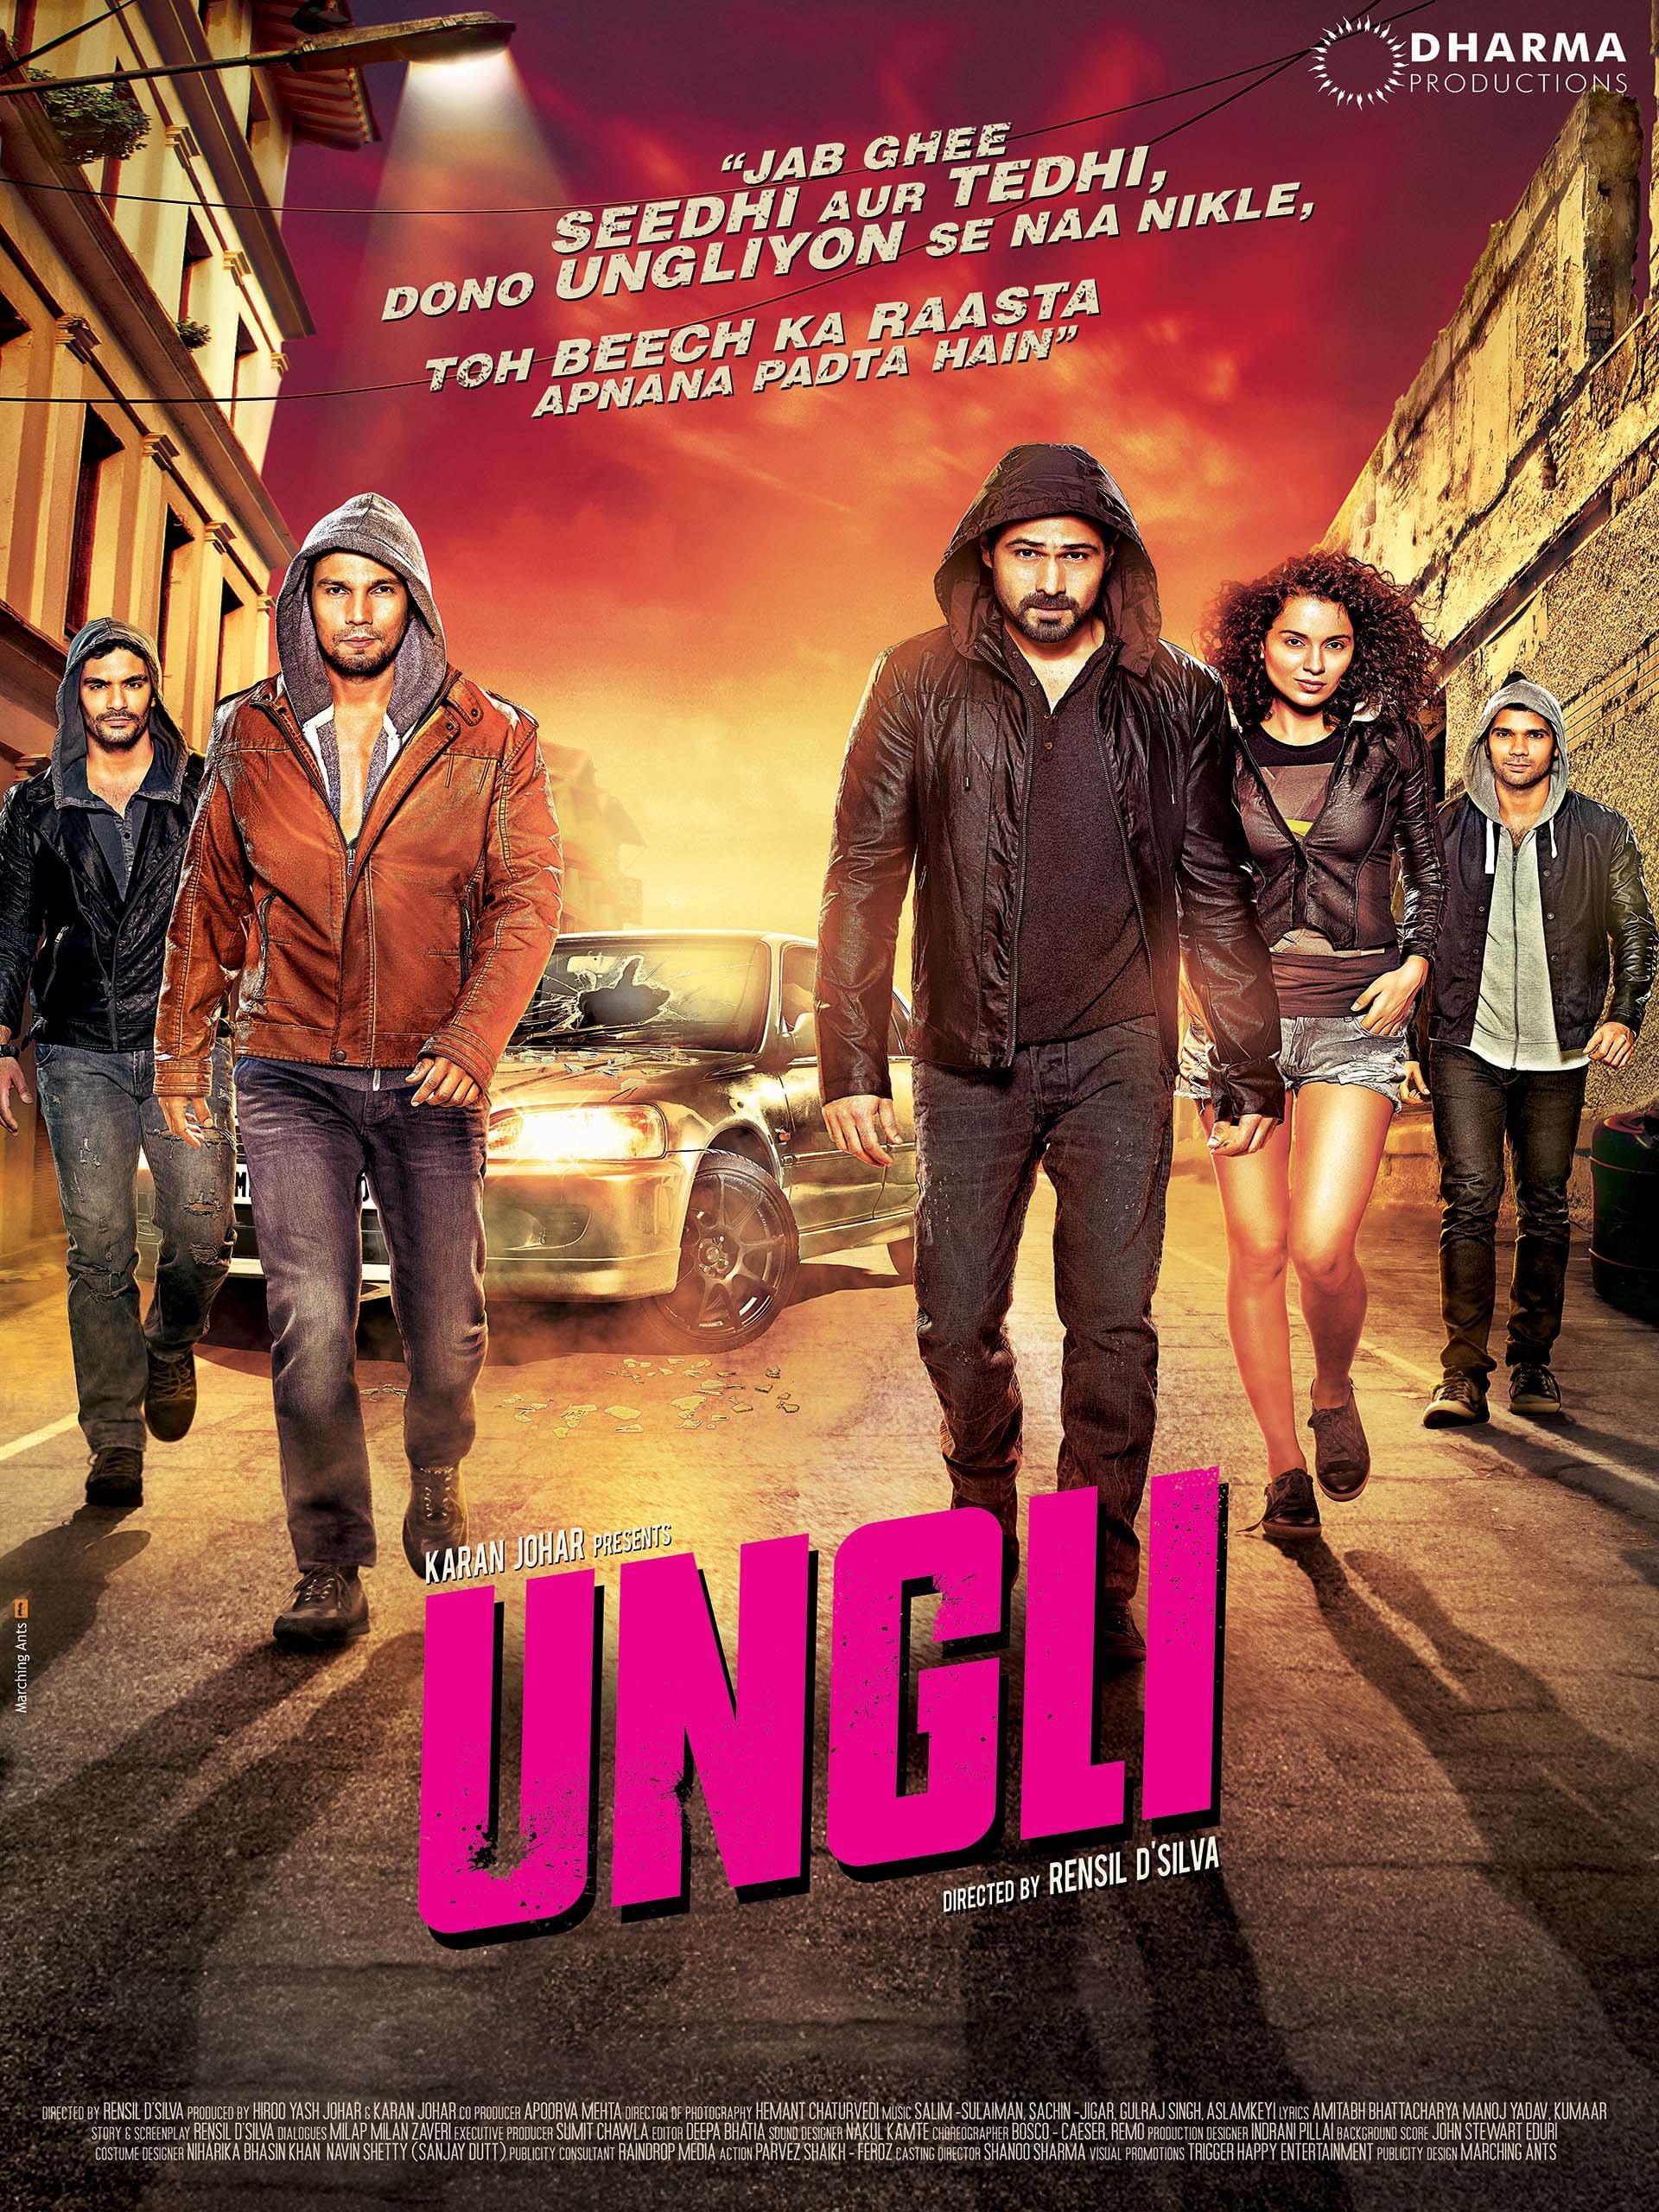 Ungli (2014) Hindi 1080p WebHD AVC DD 5.1 ESuBS By-DusIcTv | 8.80 GB |